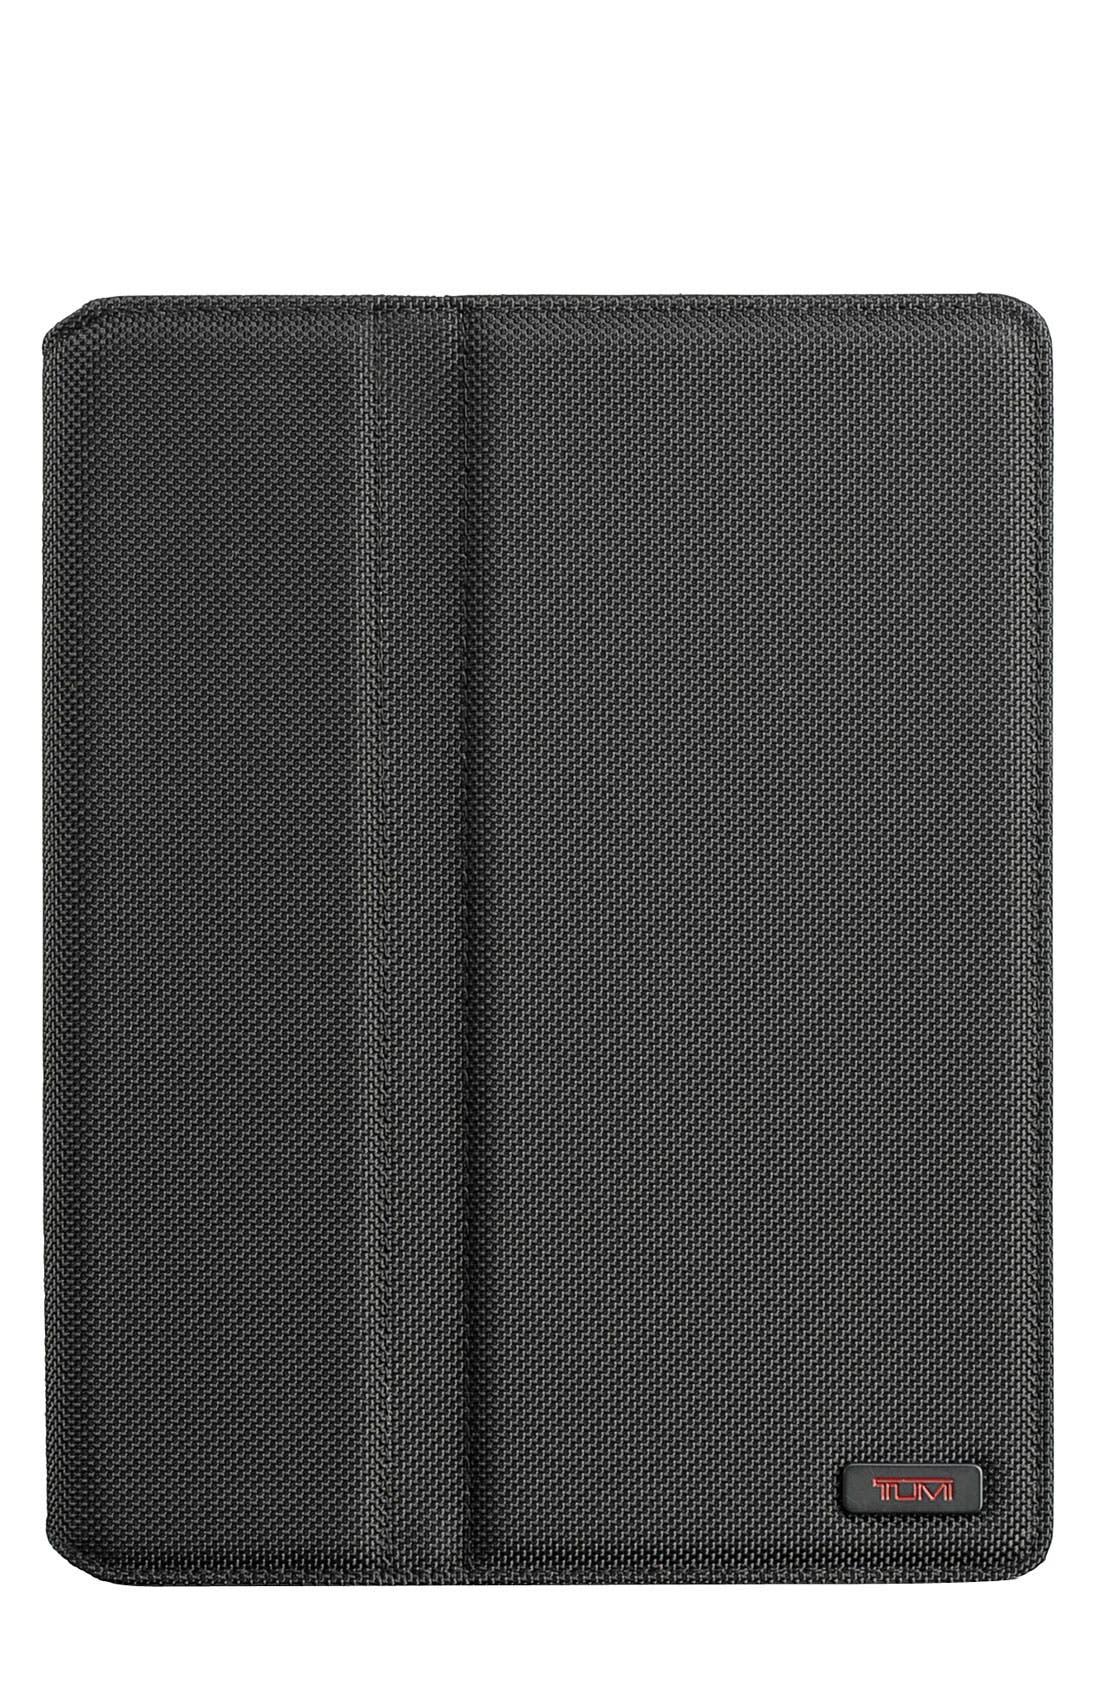 Ballistic Nylon iPad 2 Cover,                         Main,                         color, 007